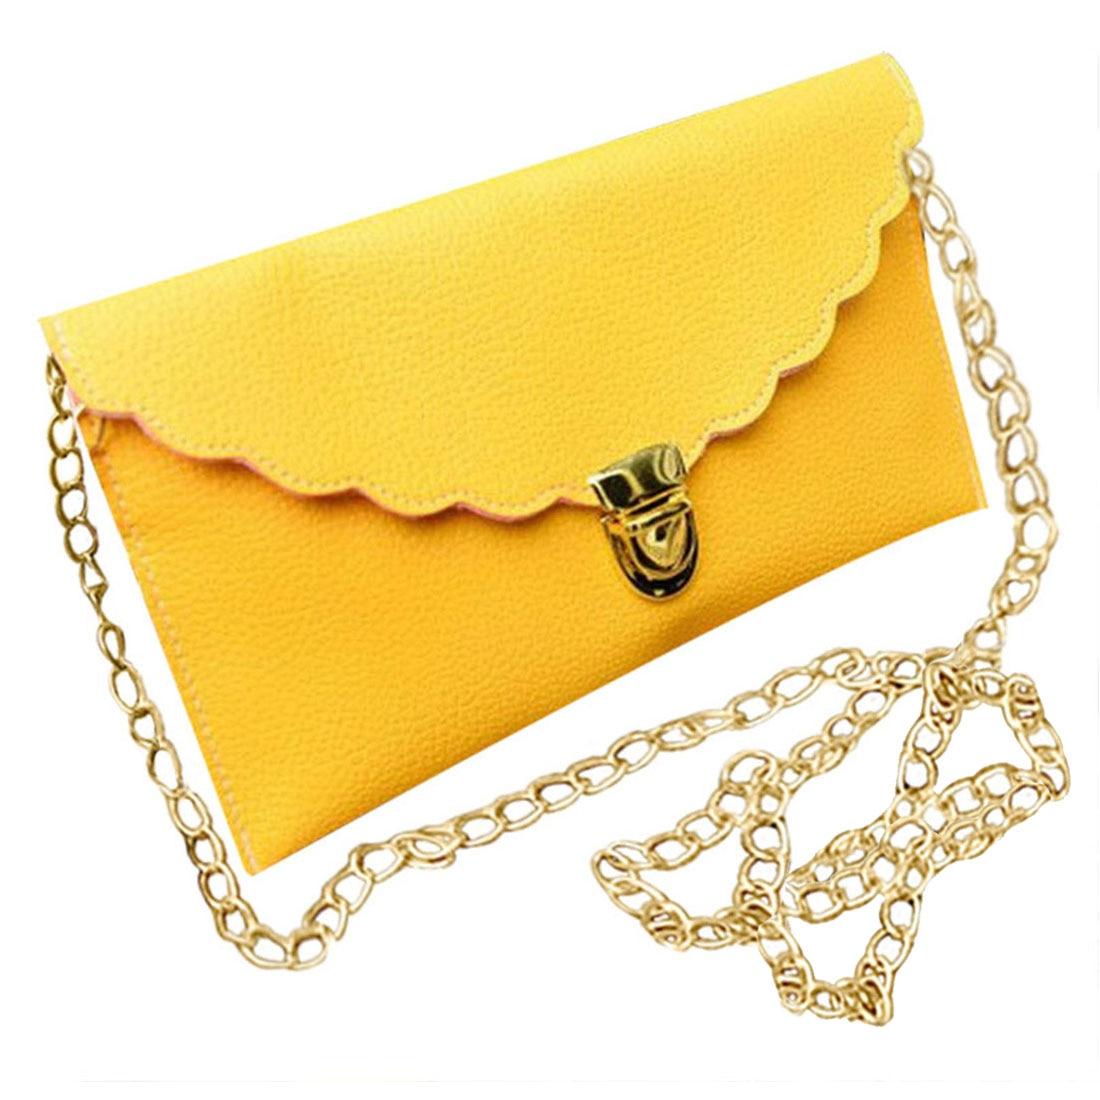 Ladies Handbag Imitation Leather Shoulder Bag Fashion Wallet Long Metal Chain Lady Handbag, Yellow ladies handbag long chain female bag 14 colors lmitation leather shoulder bag fashion wallet metal chain lady handbag wholesale